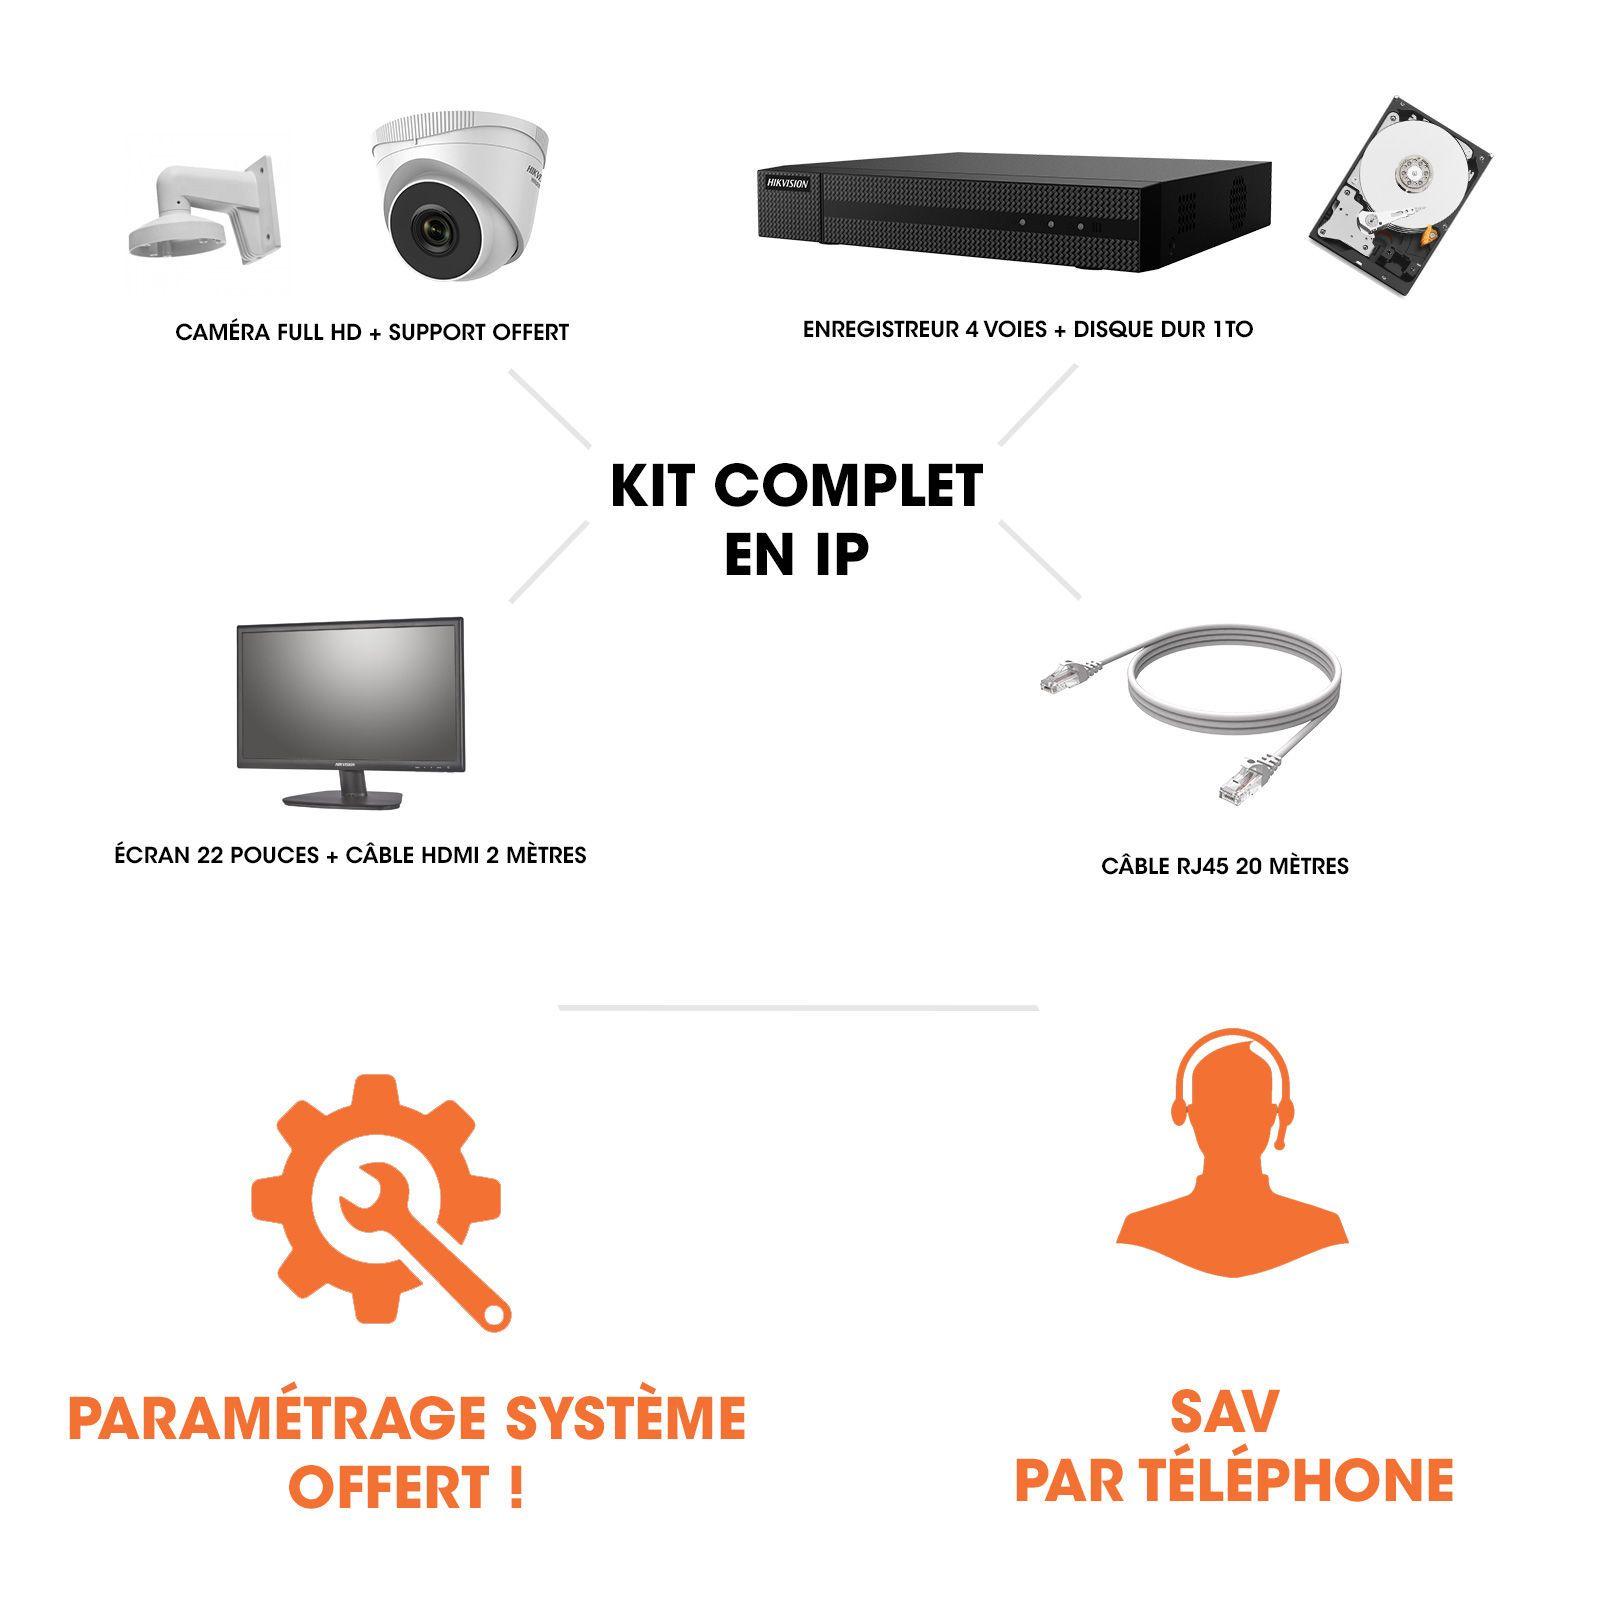 Kit vidéosurveillance | Magasin & commerce | 1 caméra full HD vision nocturne